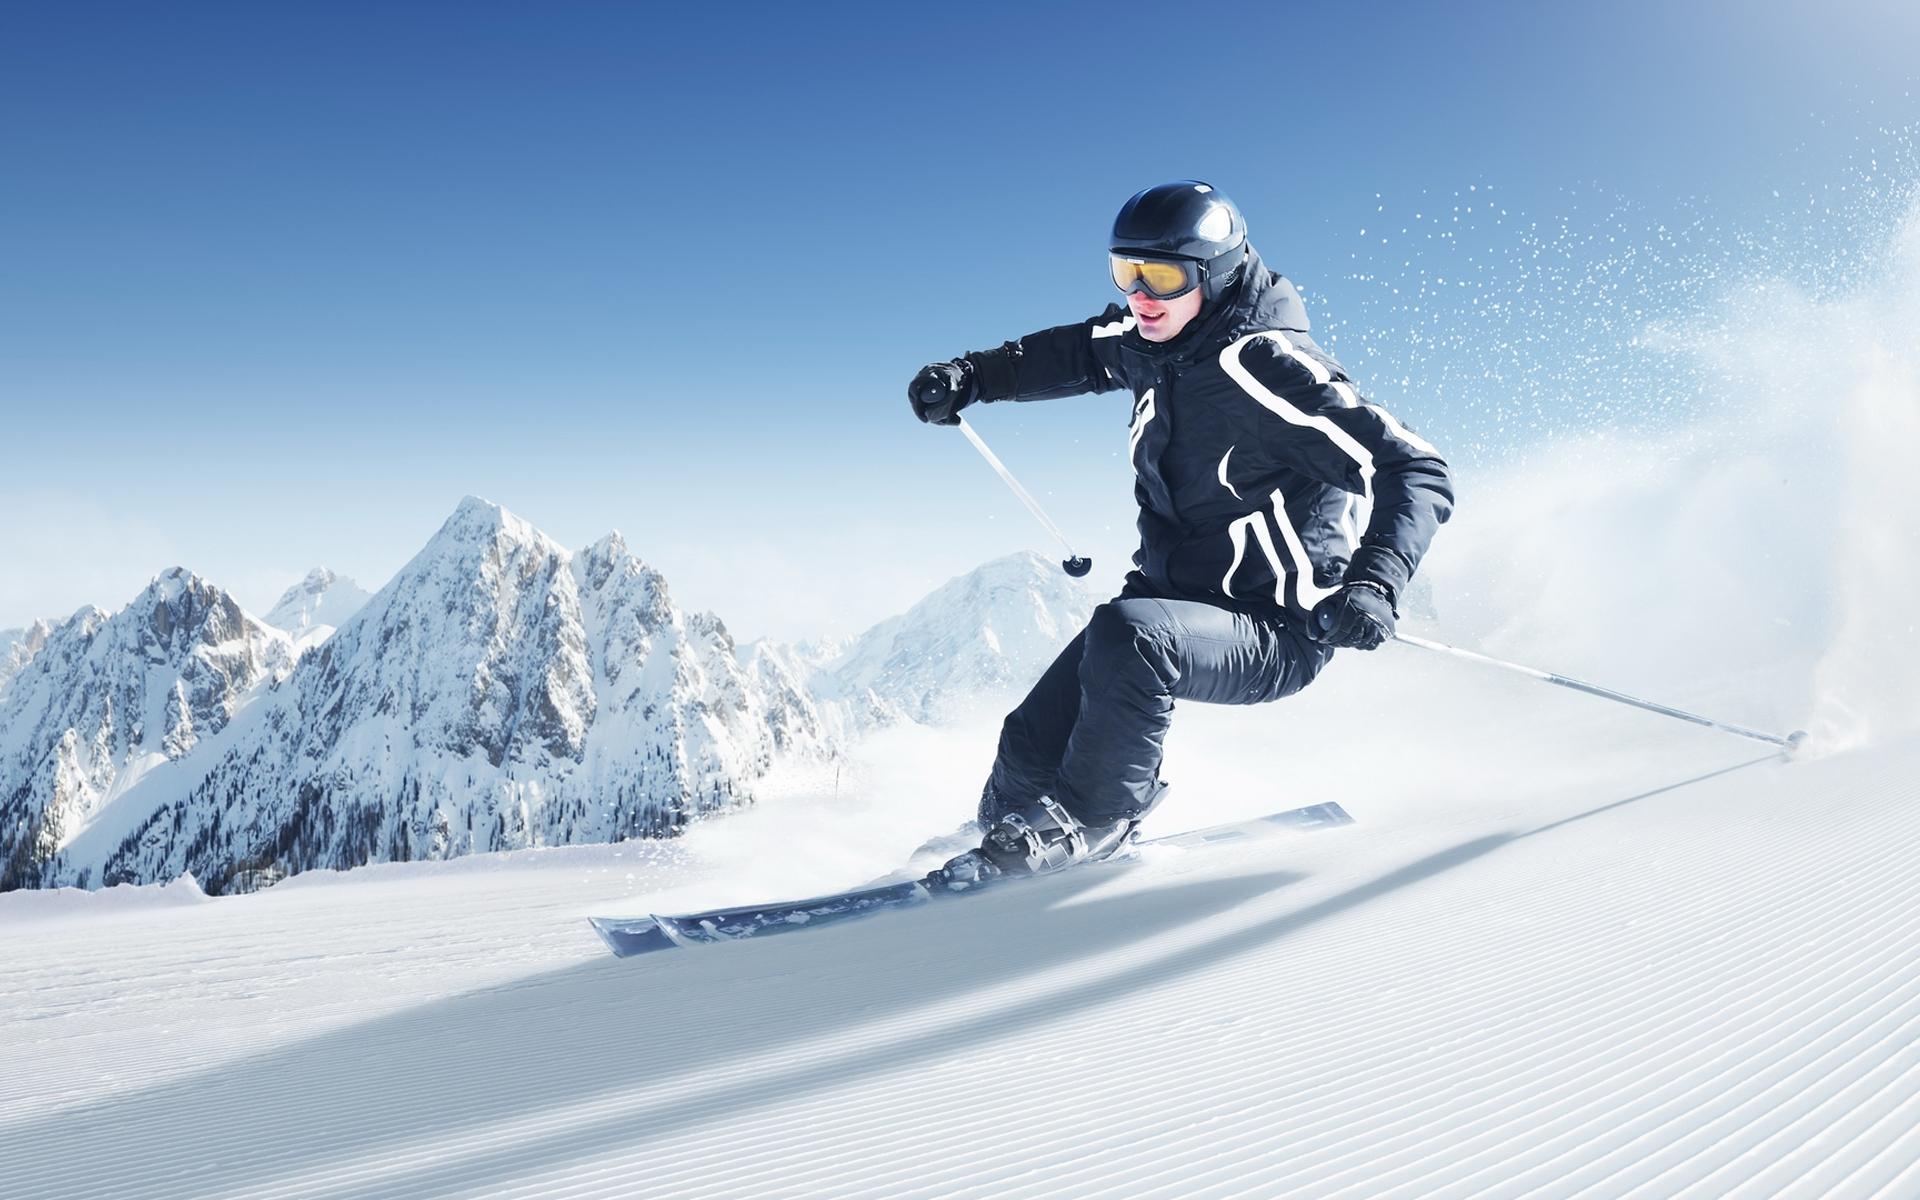 skiing wallpaper 4101